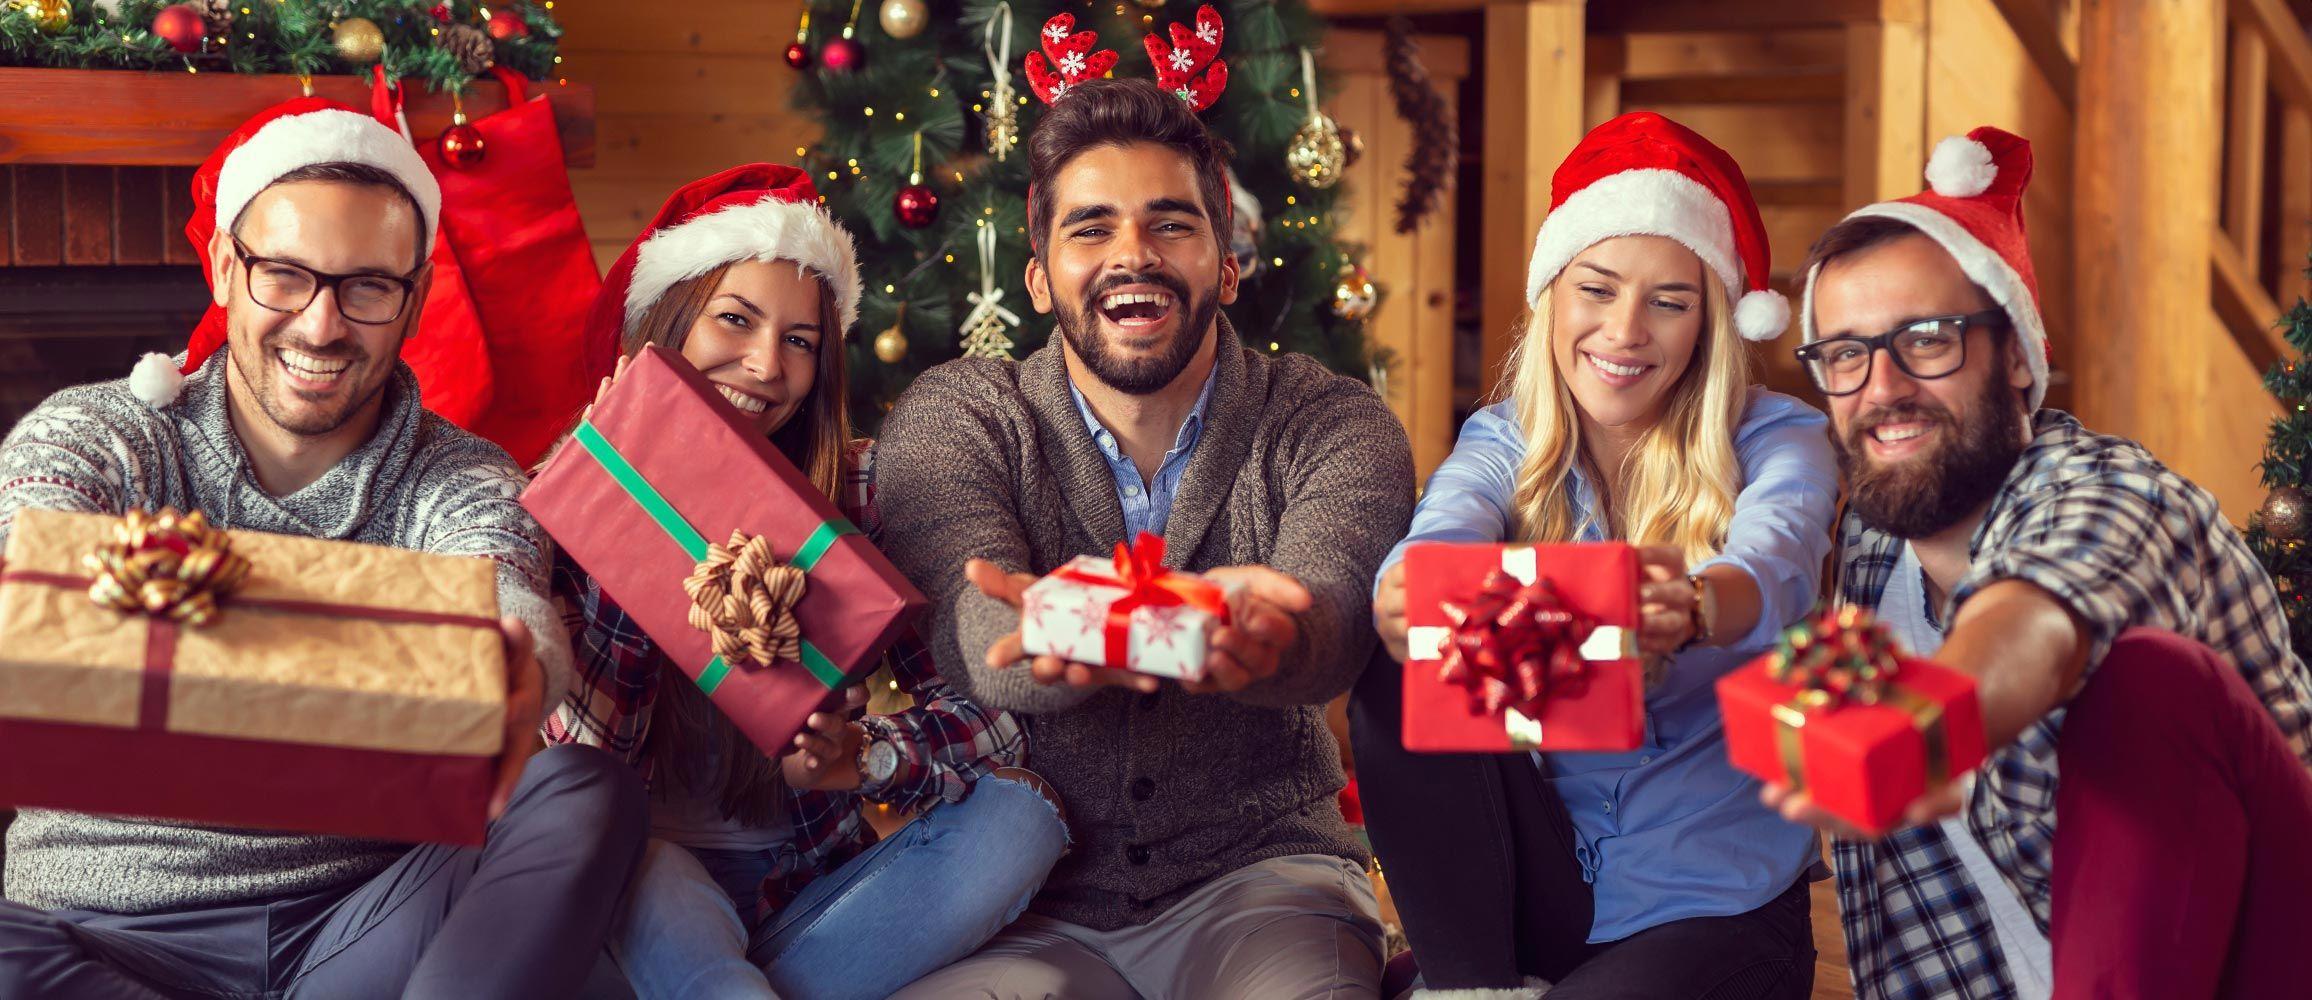 Group of friends celebrating Secret Santa